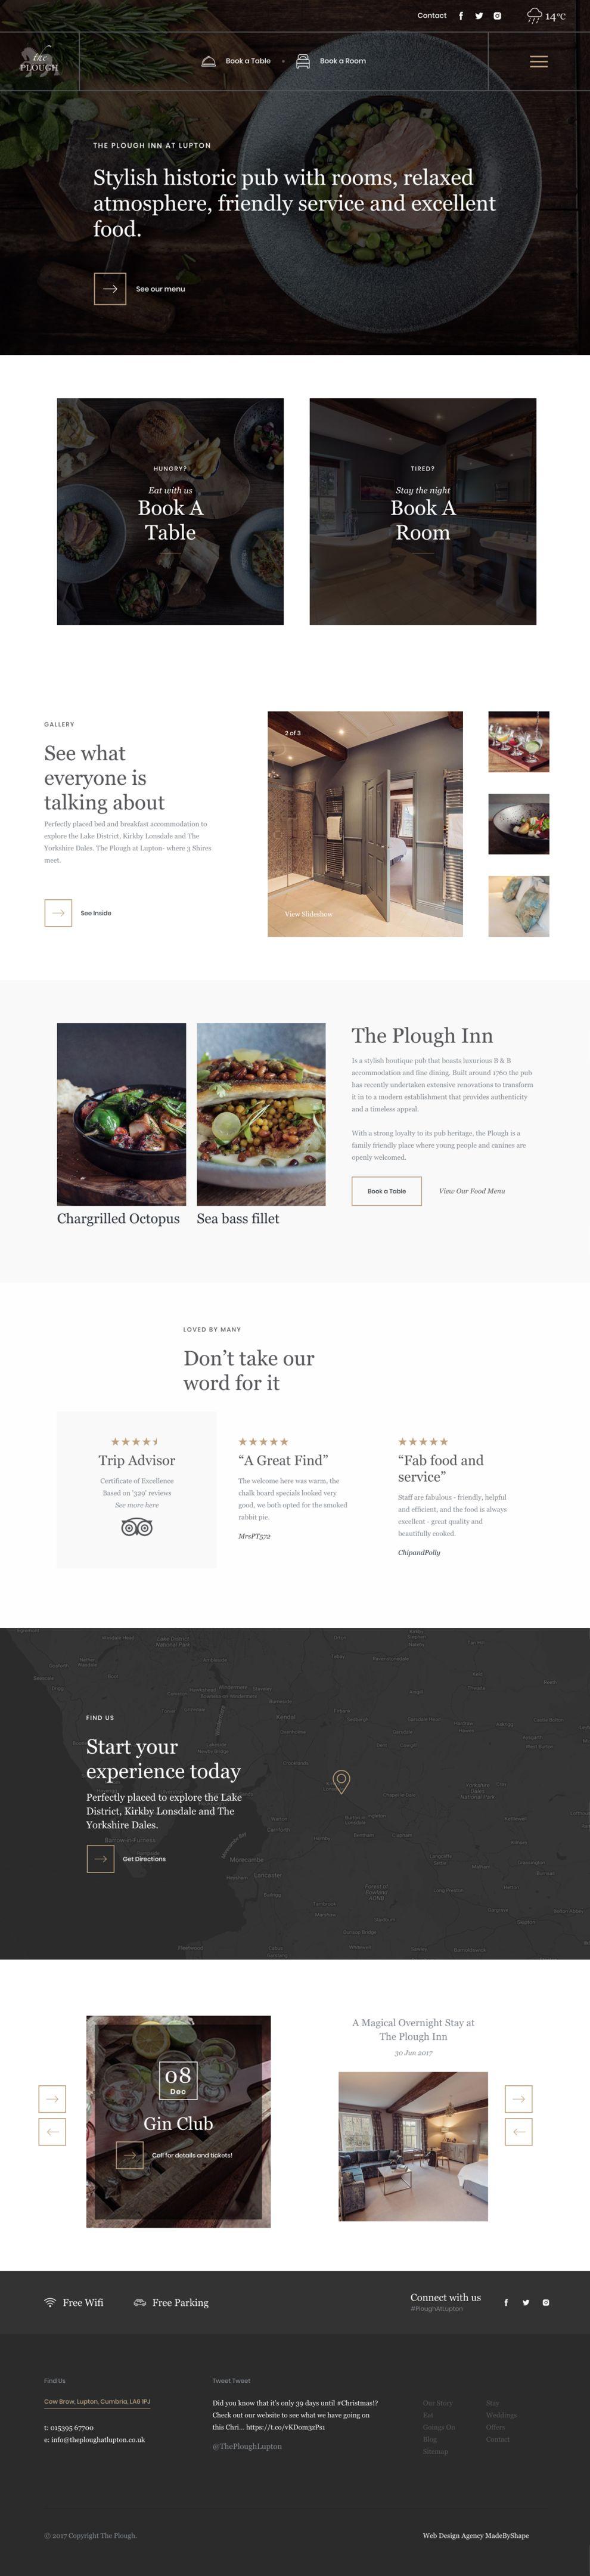 The Plough Inn Elegant Homepage